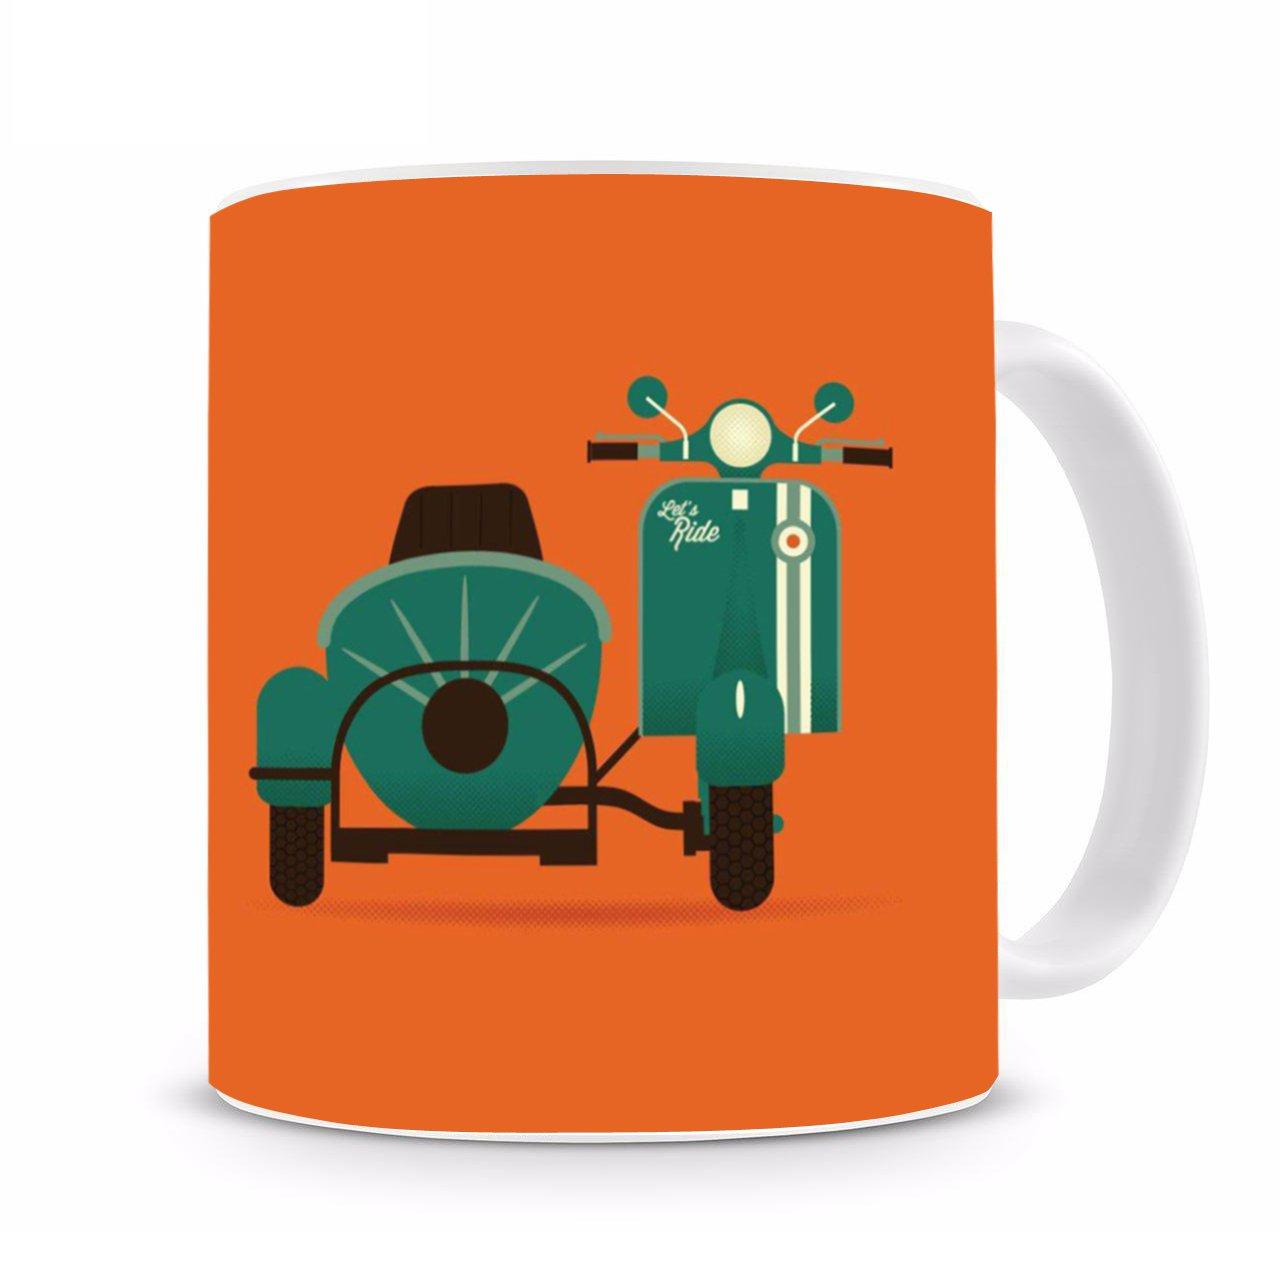 ماگ سرامیکی طرح موتور سیکلت